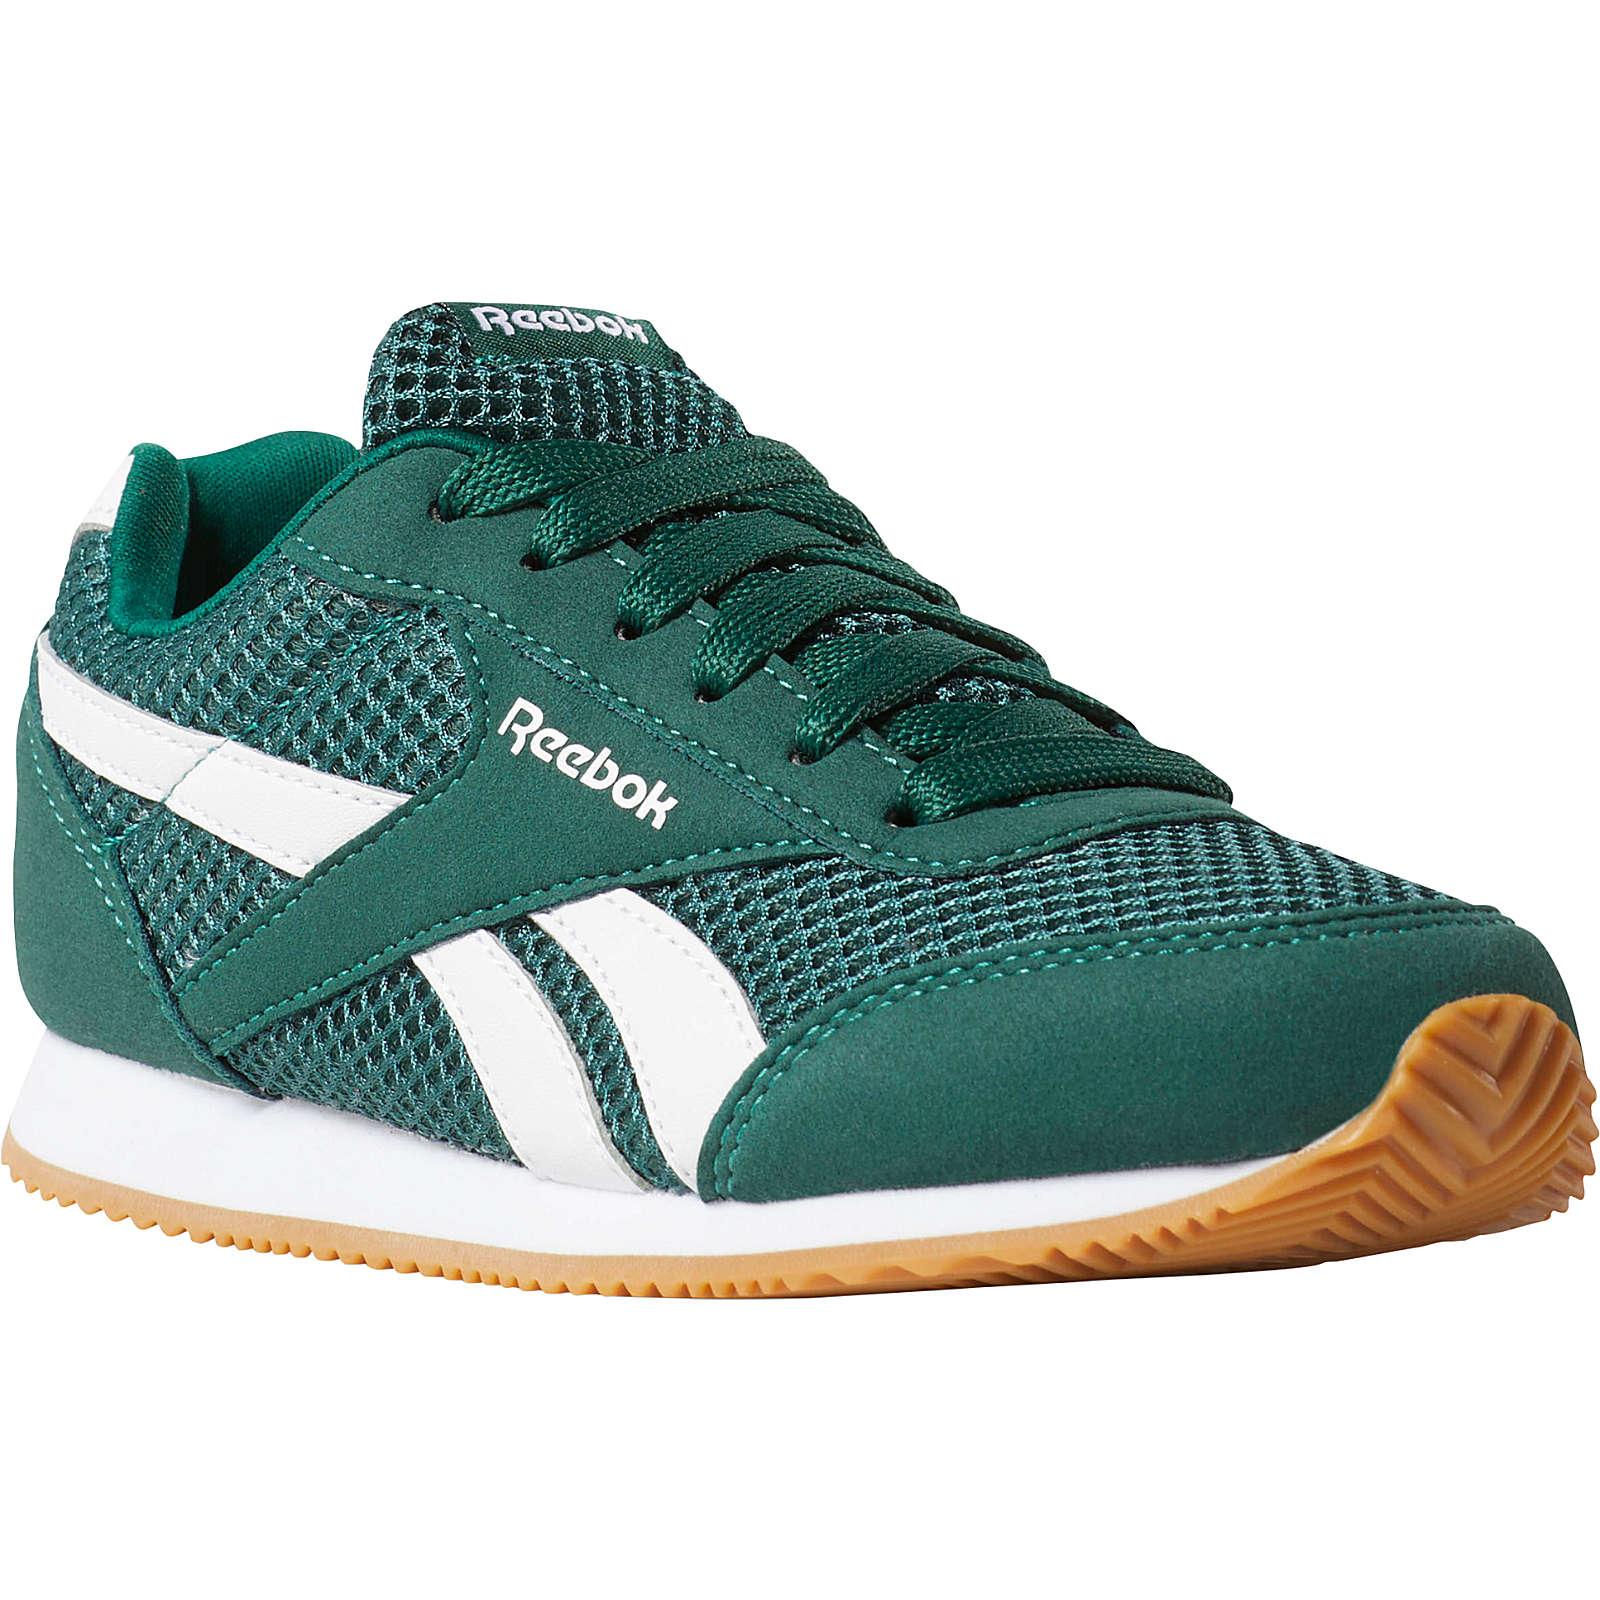 Reebok Sneakers low ROYAL CLJOG 2 für Jungen dunkelgrün Junge Gr. 36